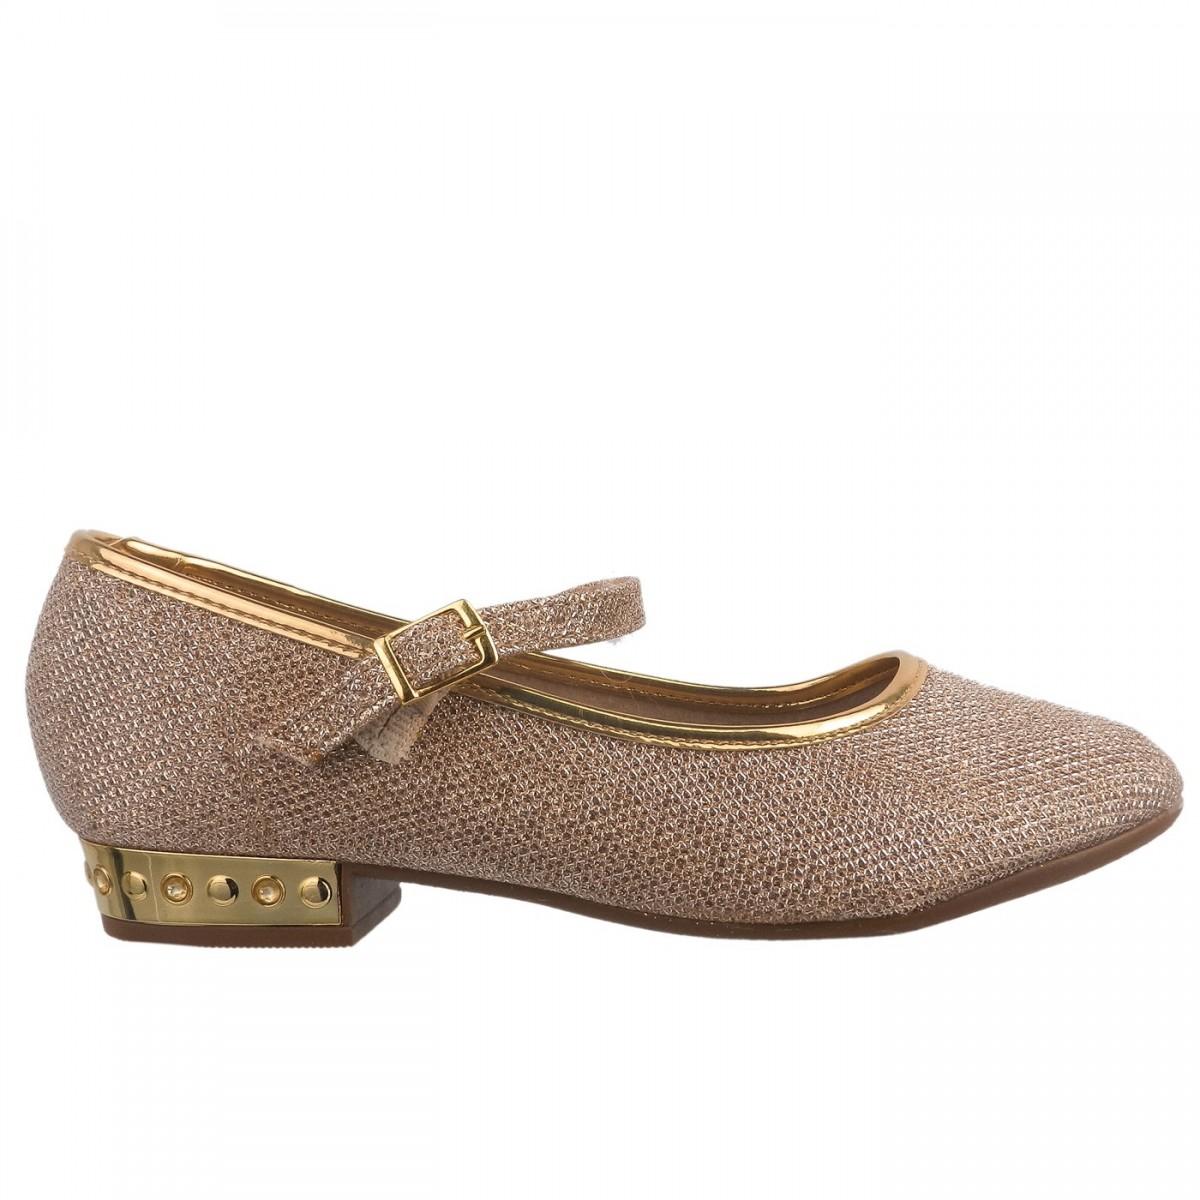 7ee790849 Bizz Store - Sapatilha Infantil Feminina Molekinha Dourada Brilho